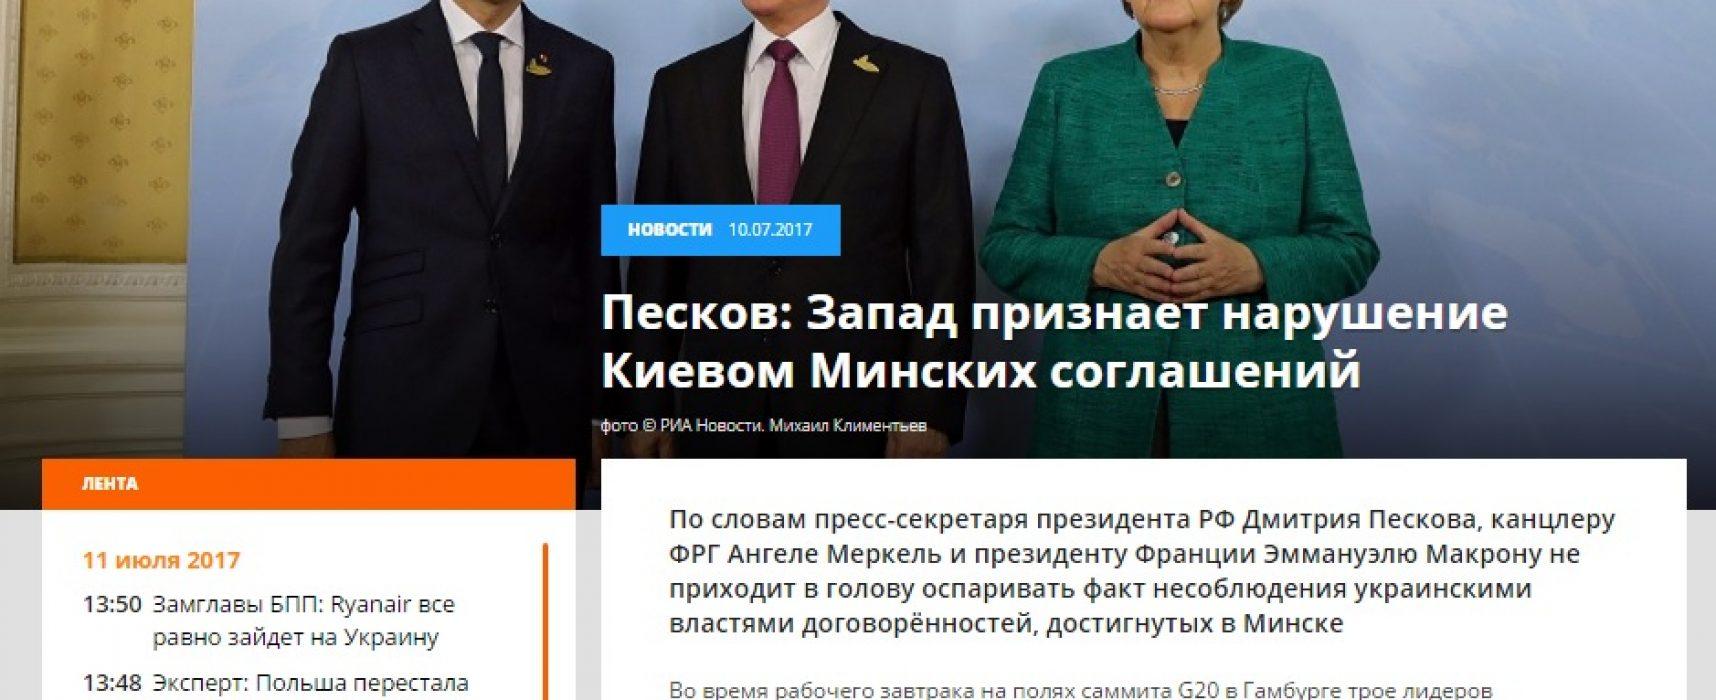 Fake: G20 Admits Kyiv's Violation of Minsk Agreements